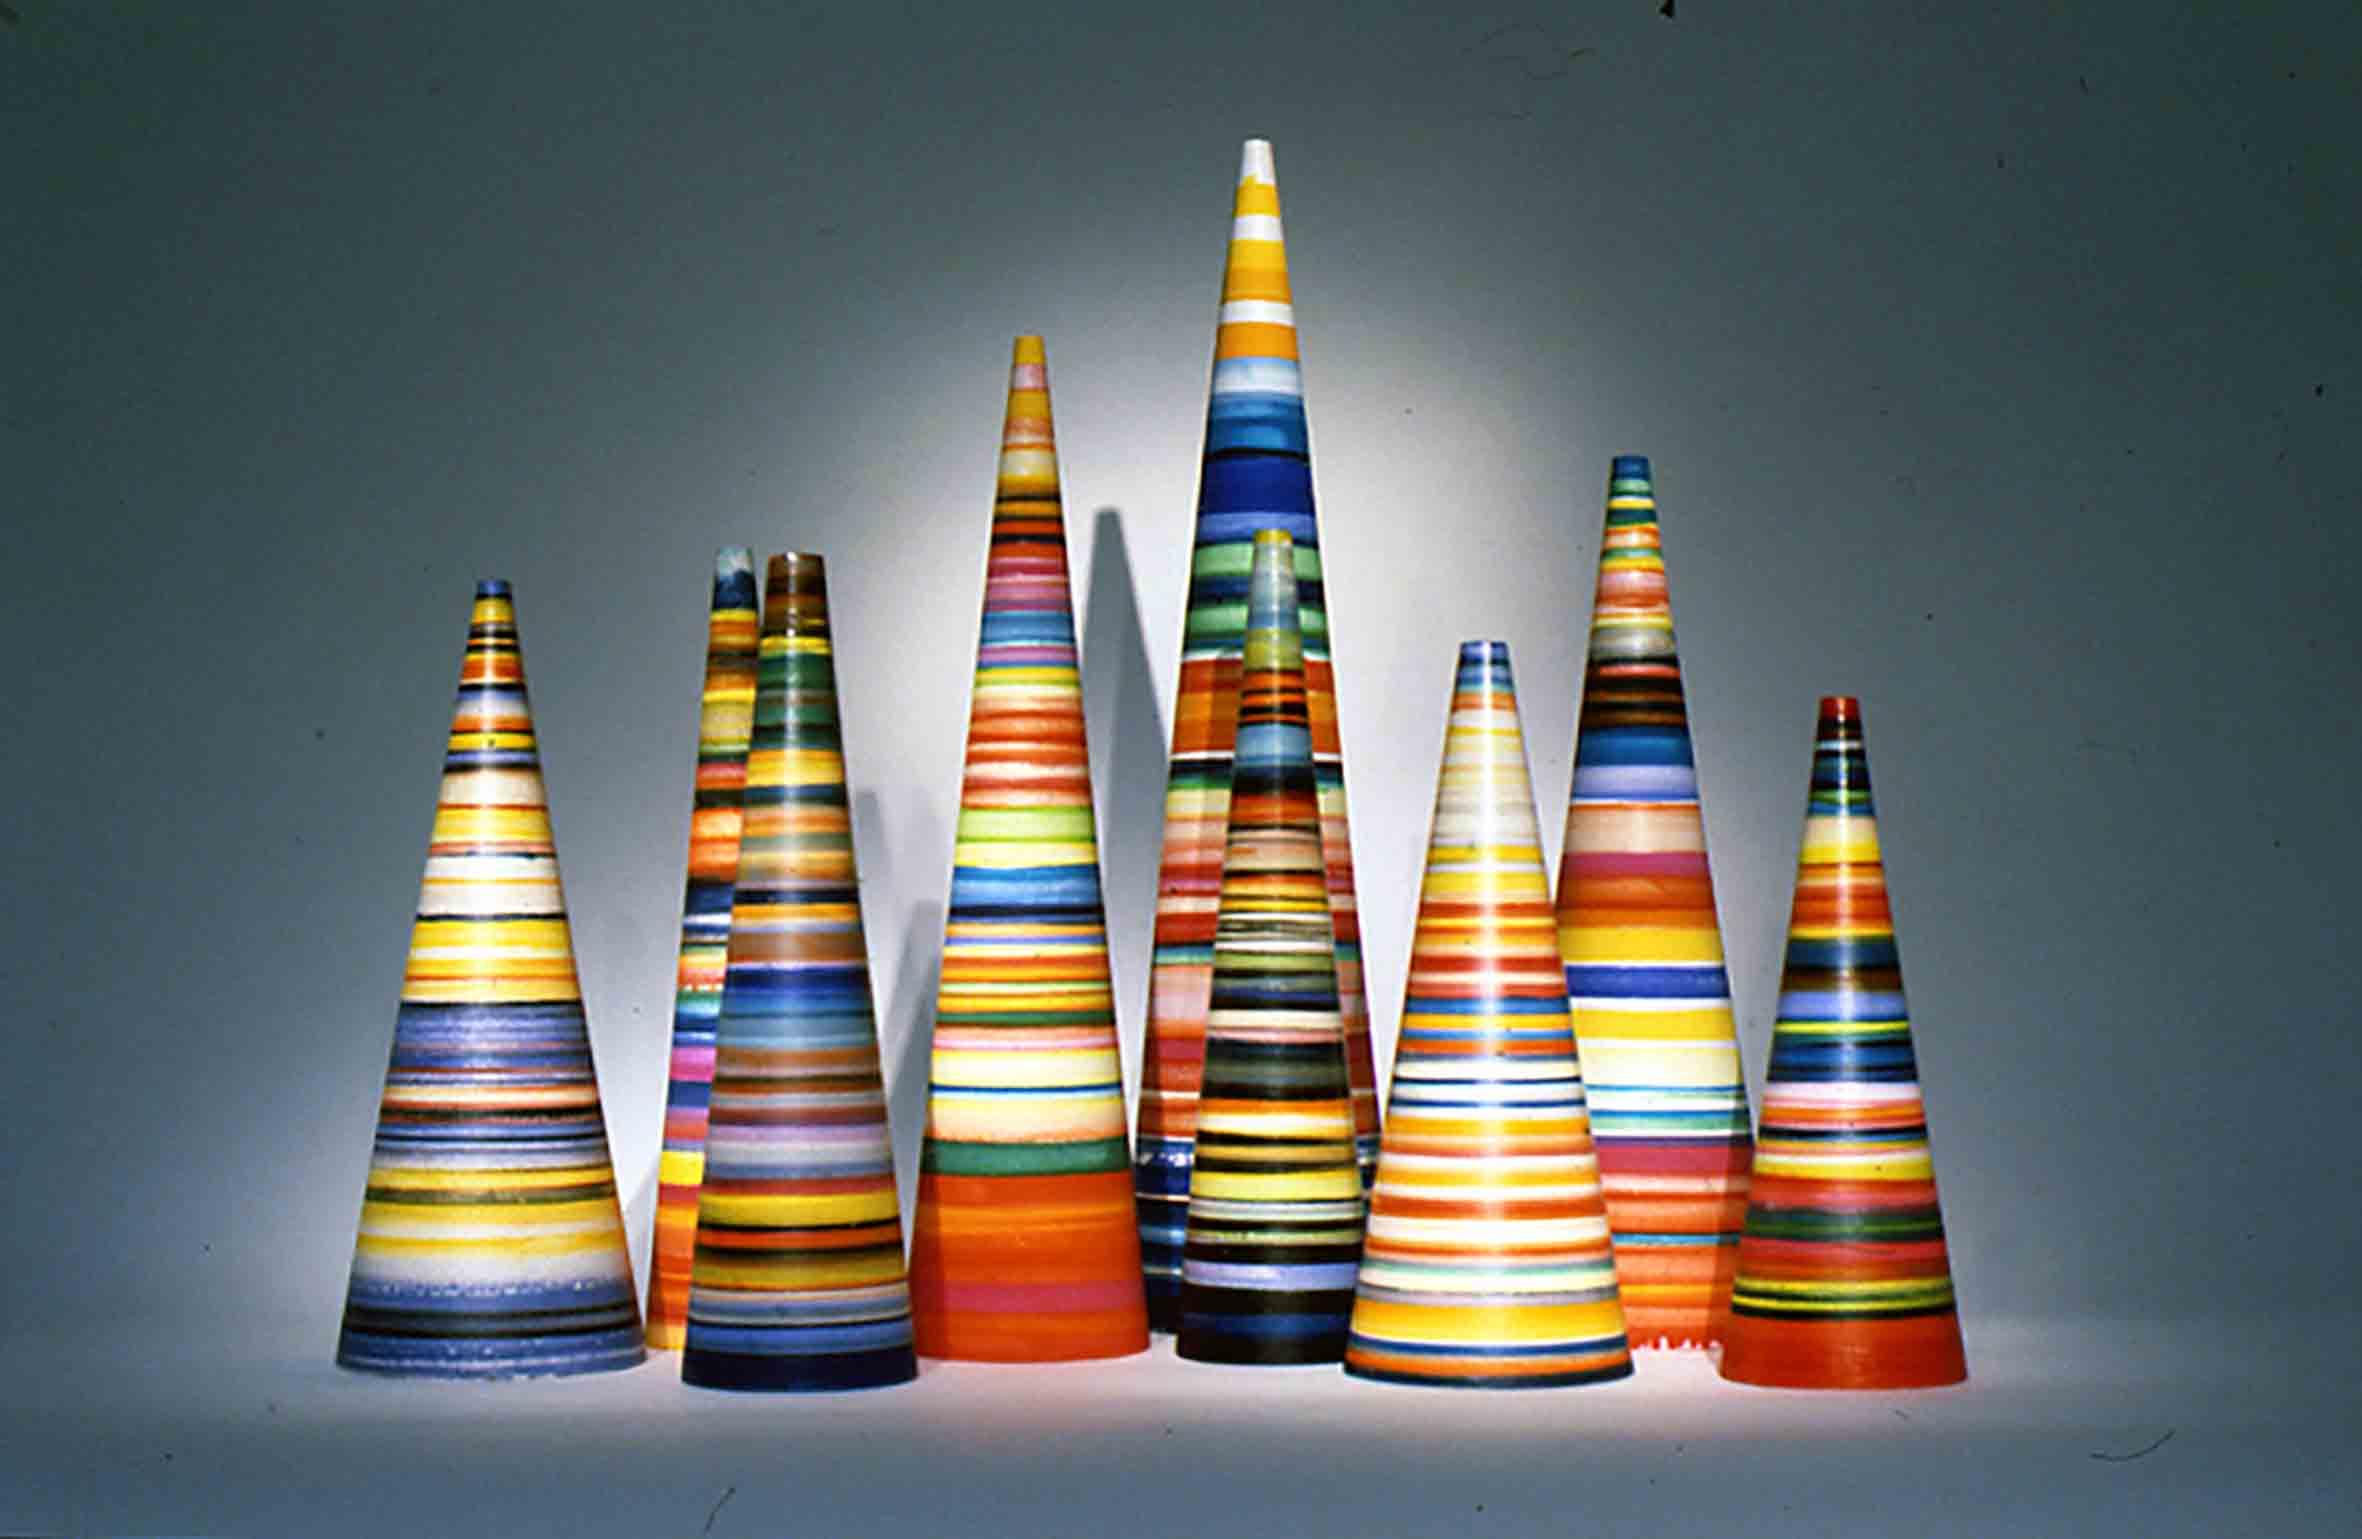 Striped Koans, 1995. Fuente: Espaivisor Gallery